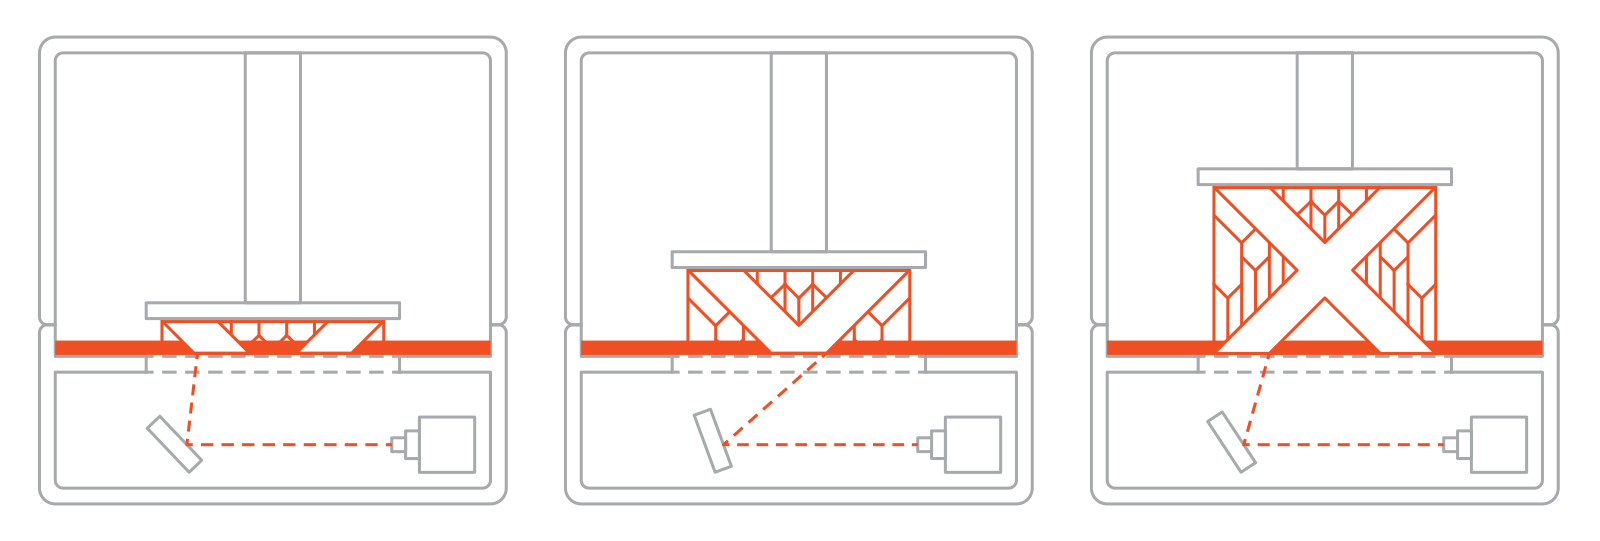 پروسه پرینت سه بعدی SLA